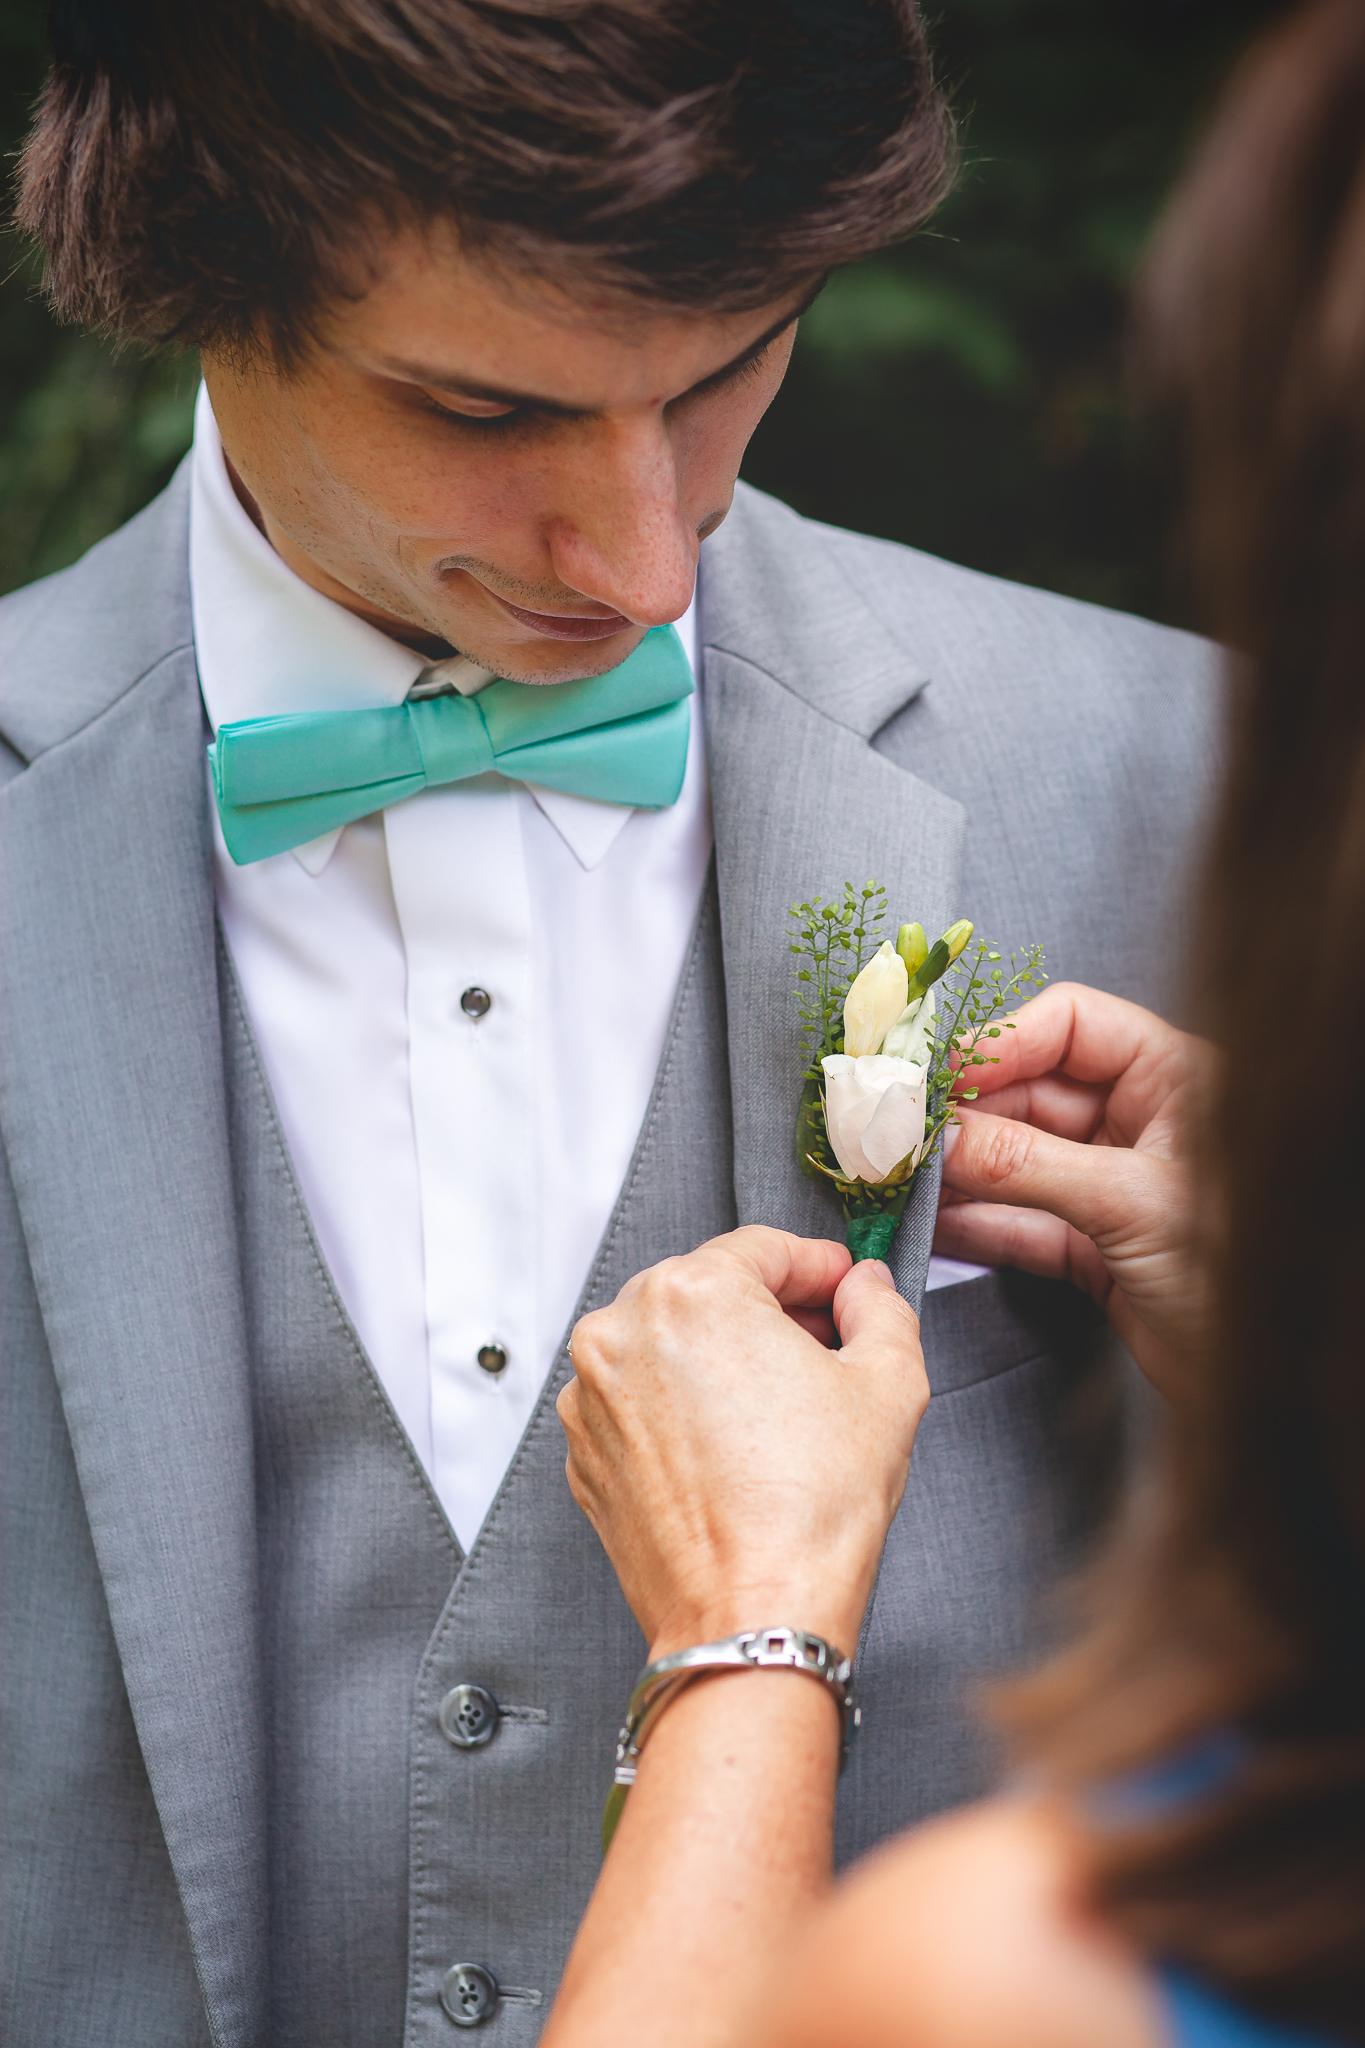 Amy D Photography- Barrie Wedding Photography- Groom Getting Ready- Getting Ready Photos-28.jpg